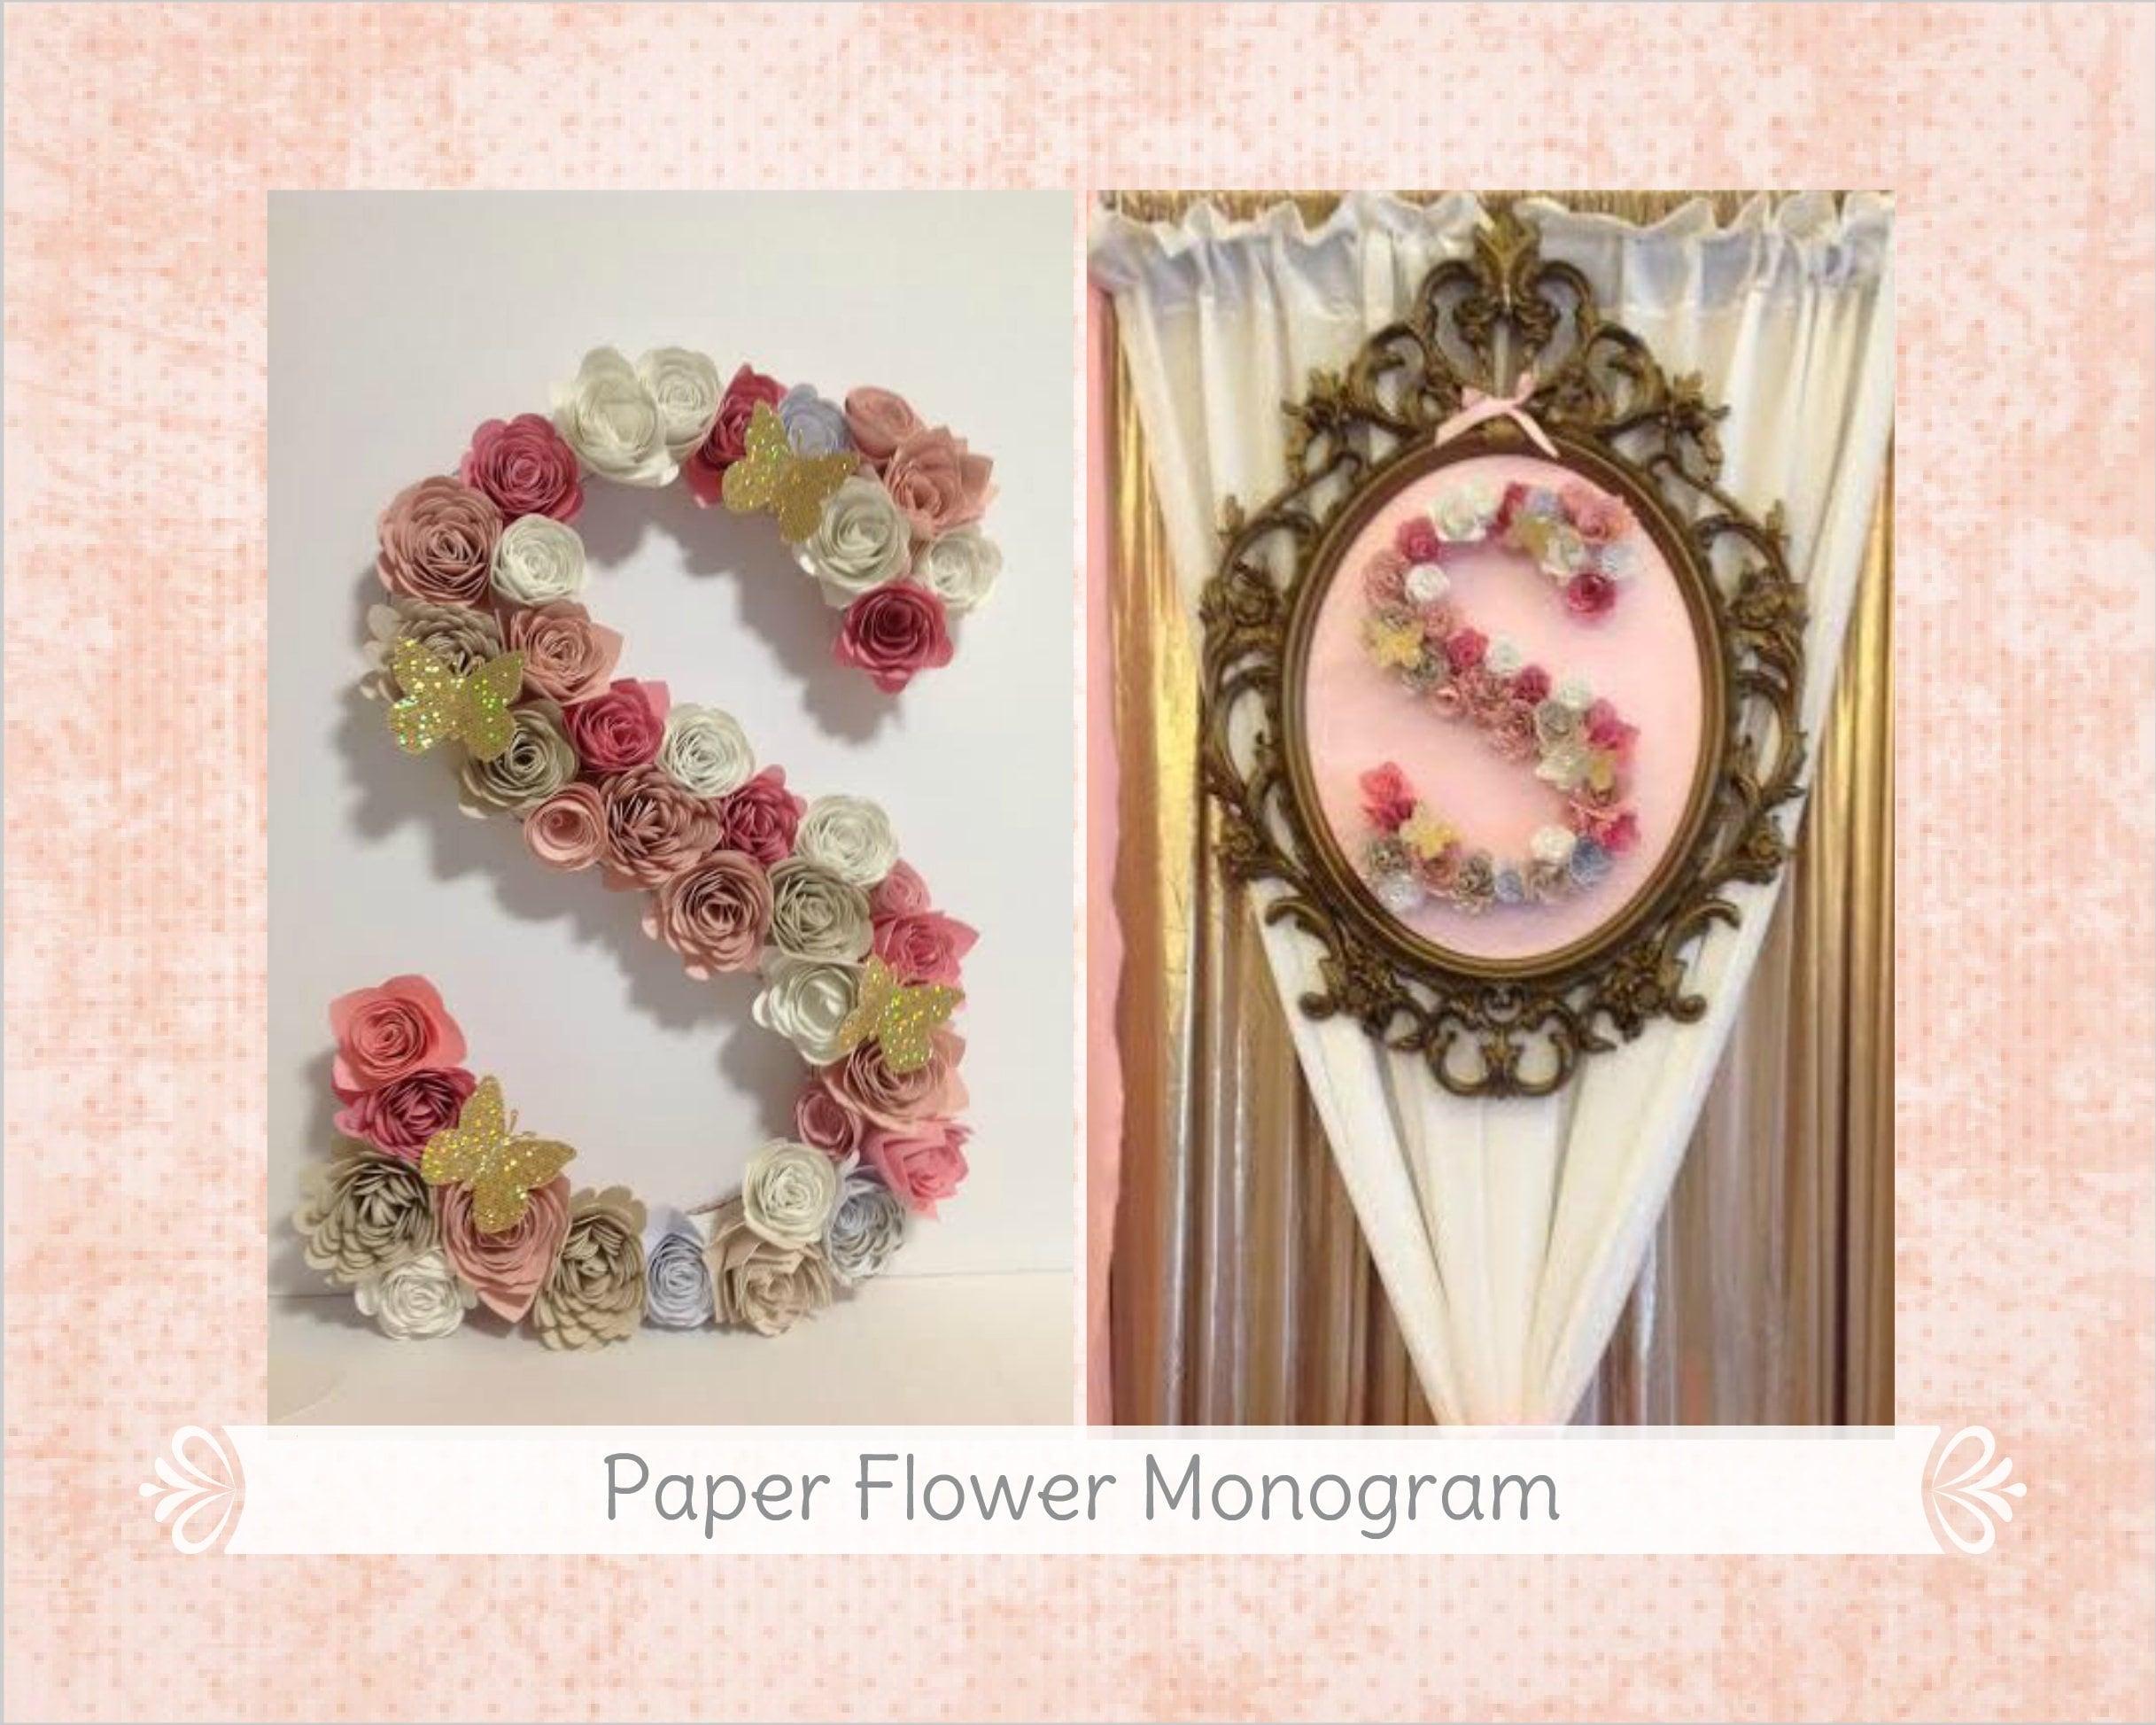 Floral Letter Nursery Decor Floral Wall Monogram Paper Flower